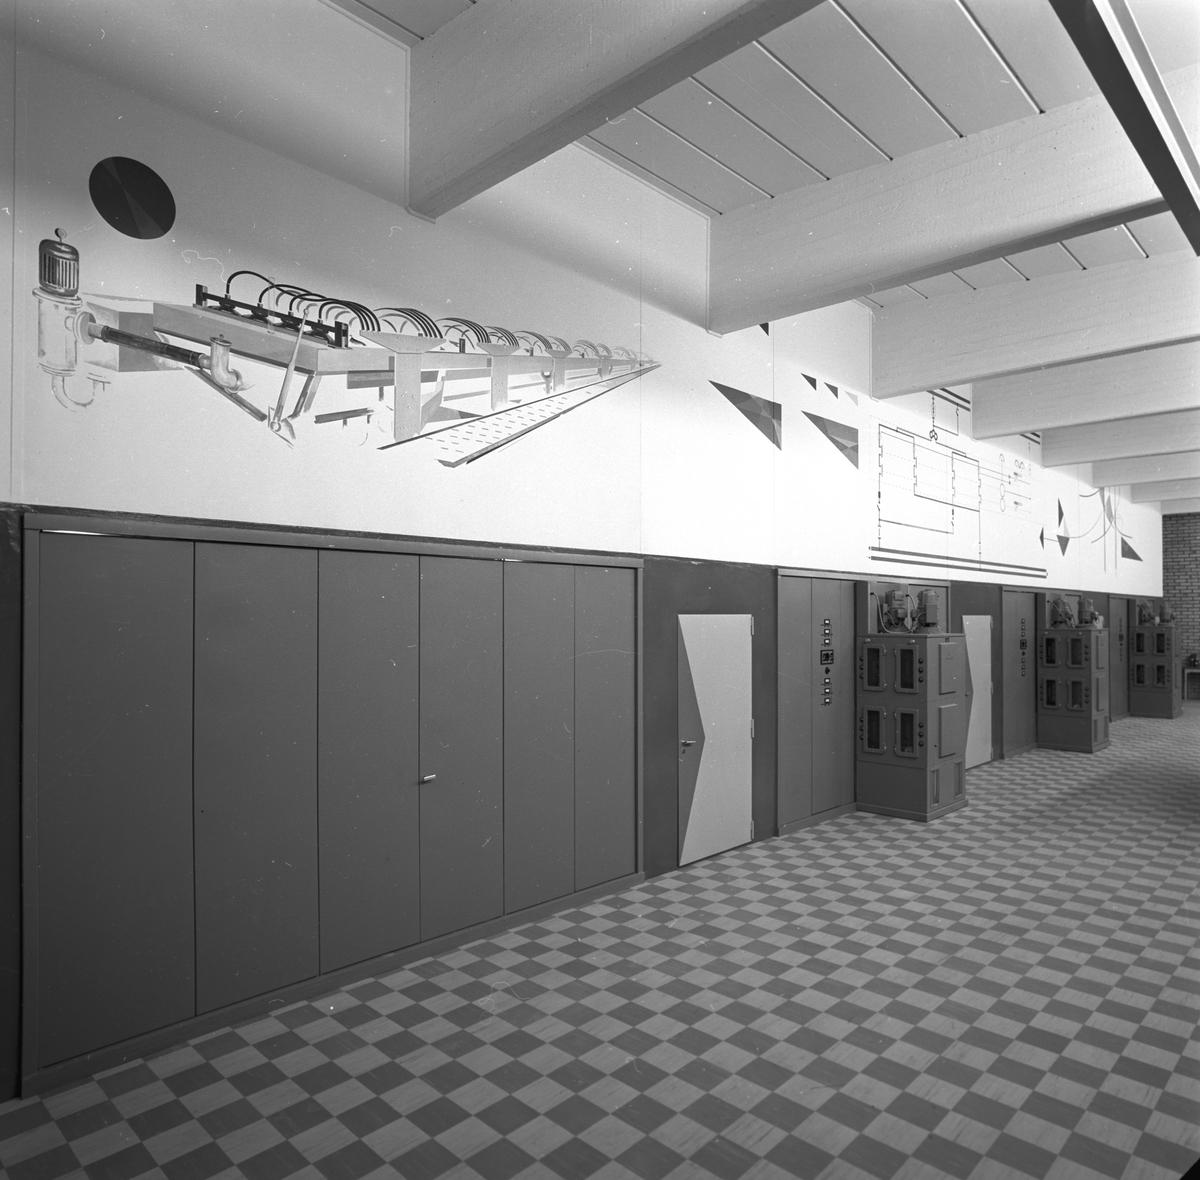 Klorfabriken. Korsnäs AB. Den 19 september 1957